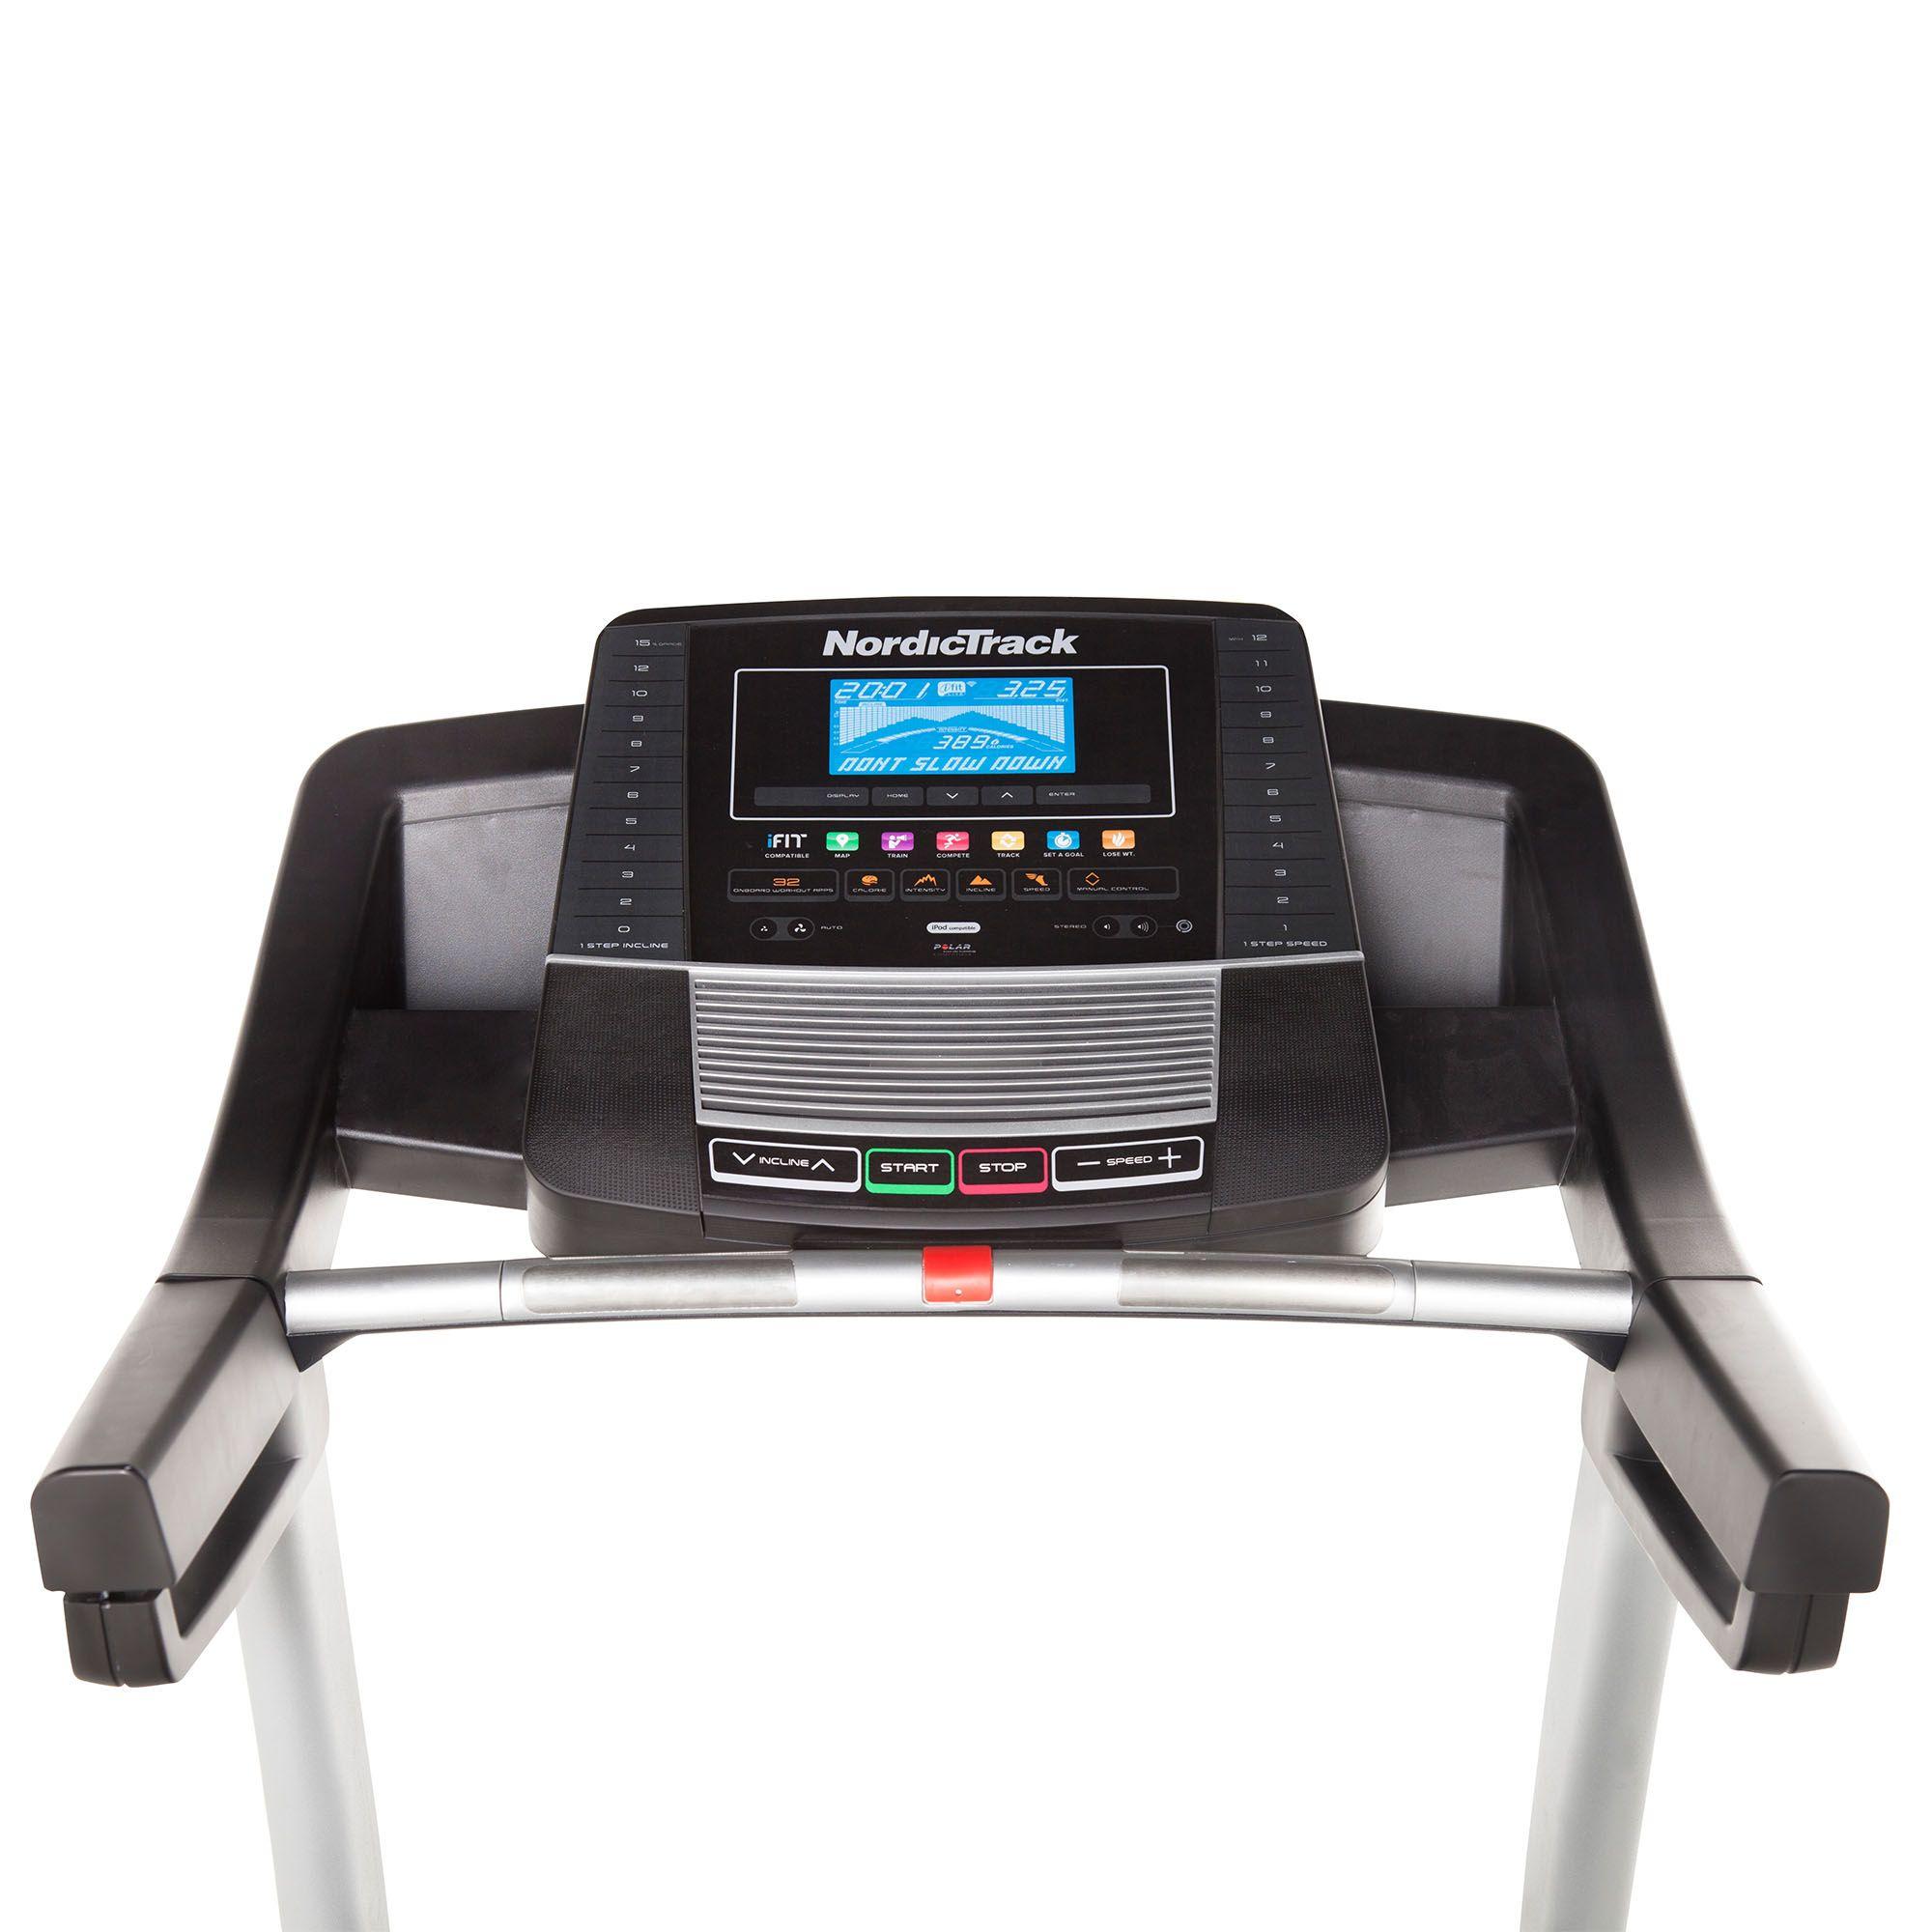 Treadmill Lubricant Nordictrack: NordicTrack T16.0 Treadmill